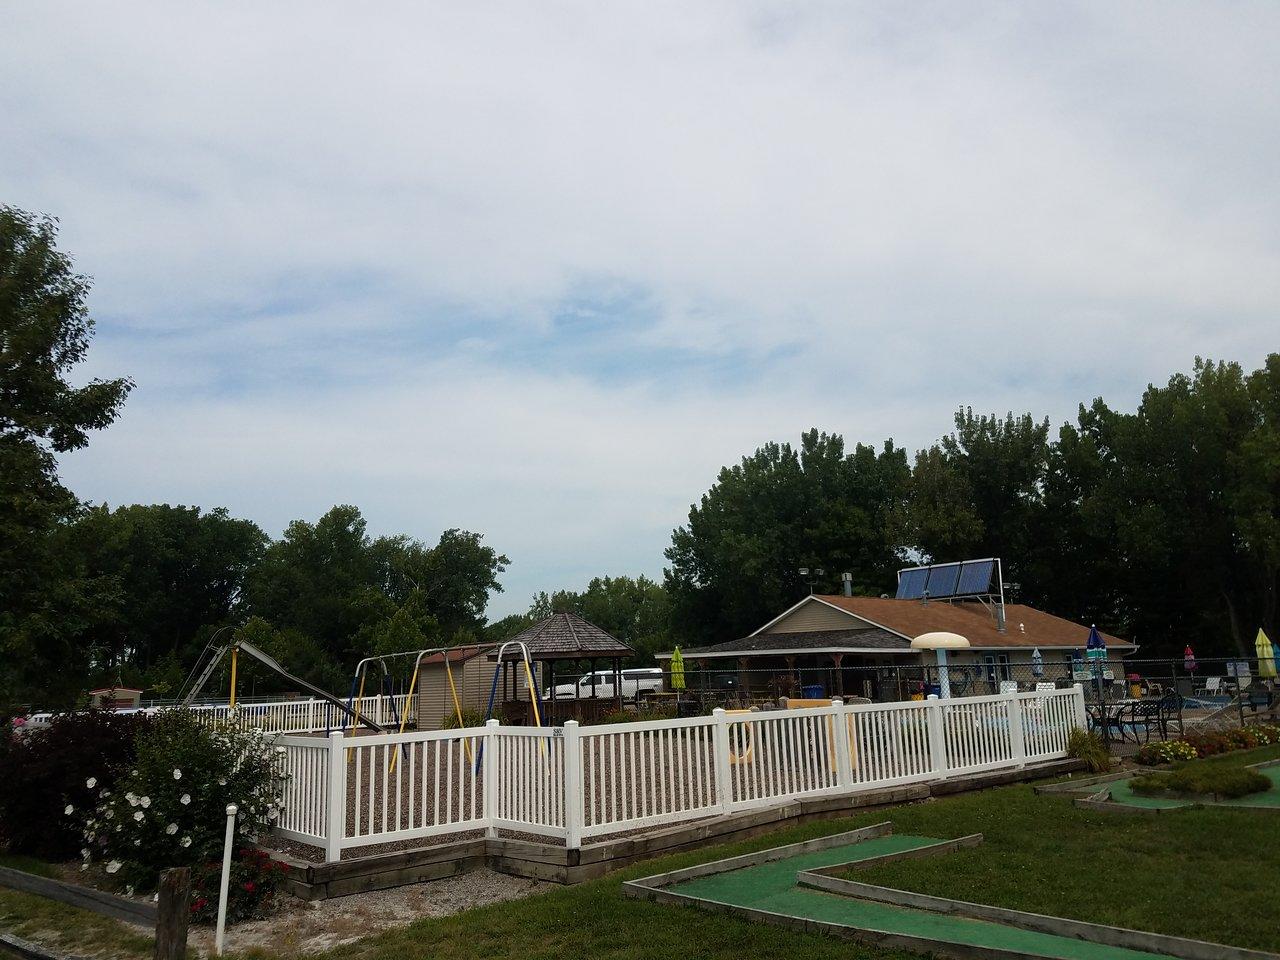 Koa Illinois Map.Rock Island Quad Cities Koa Campground Reviews Il Tripadvisor